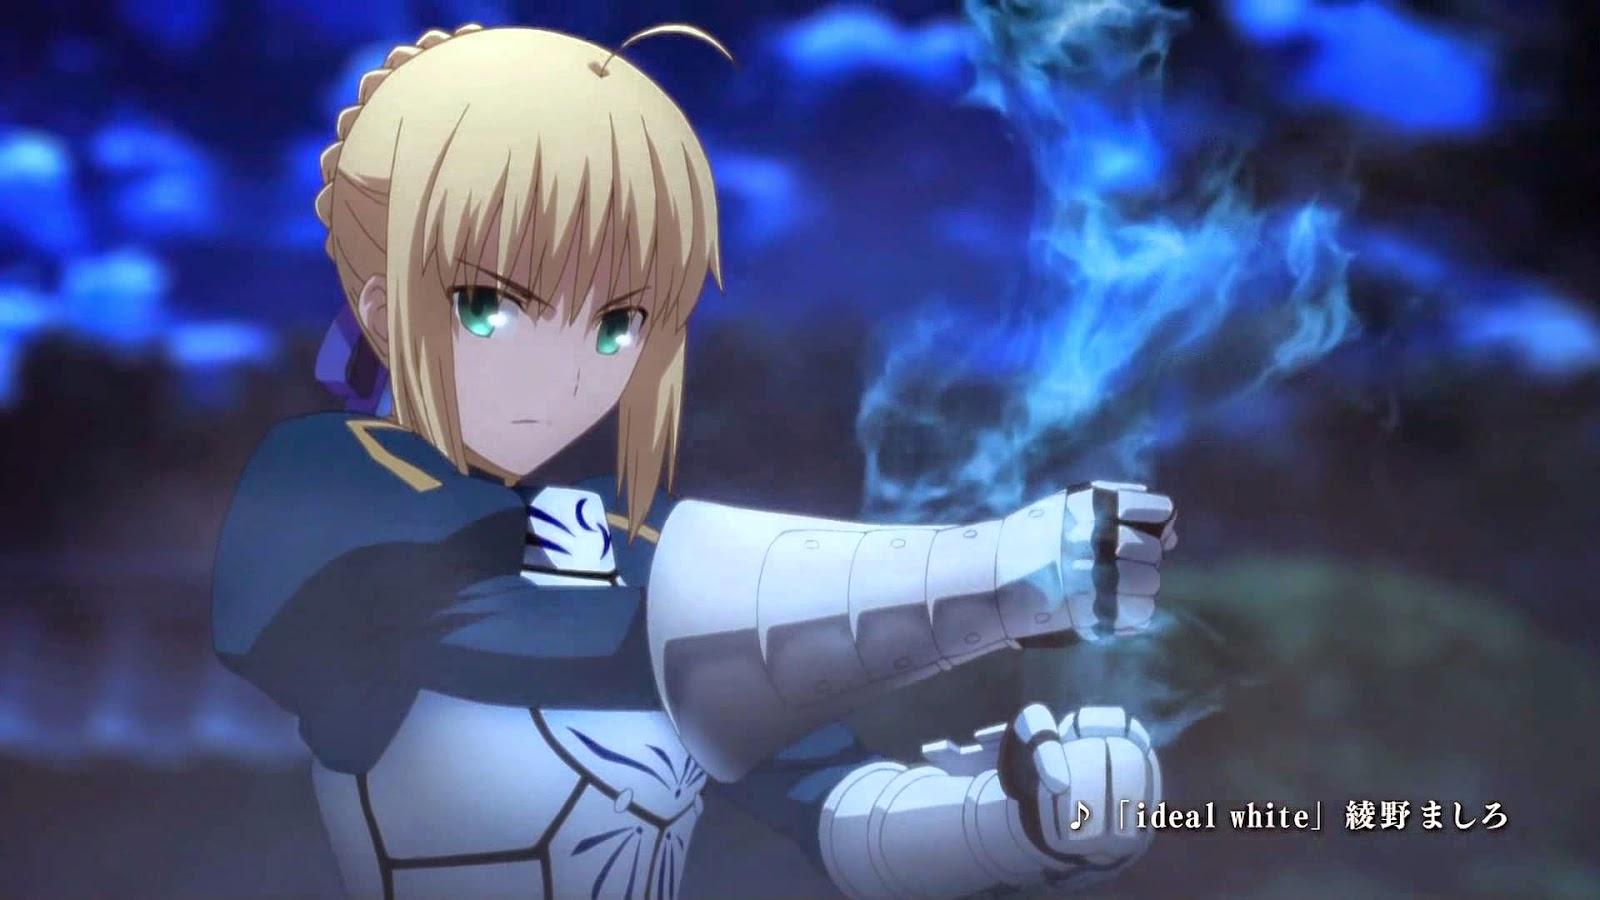 Orends Range Fatestay night Unlimited Blade Works TV Anime Promo 1600x900